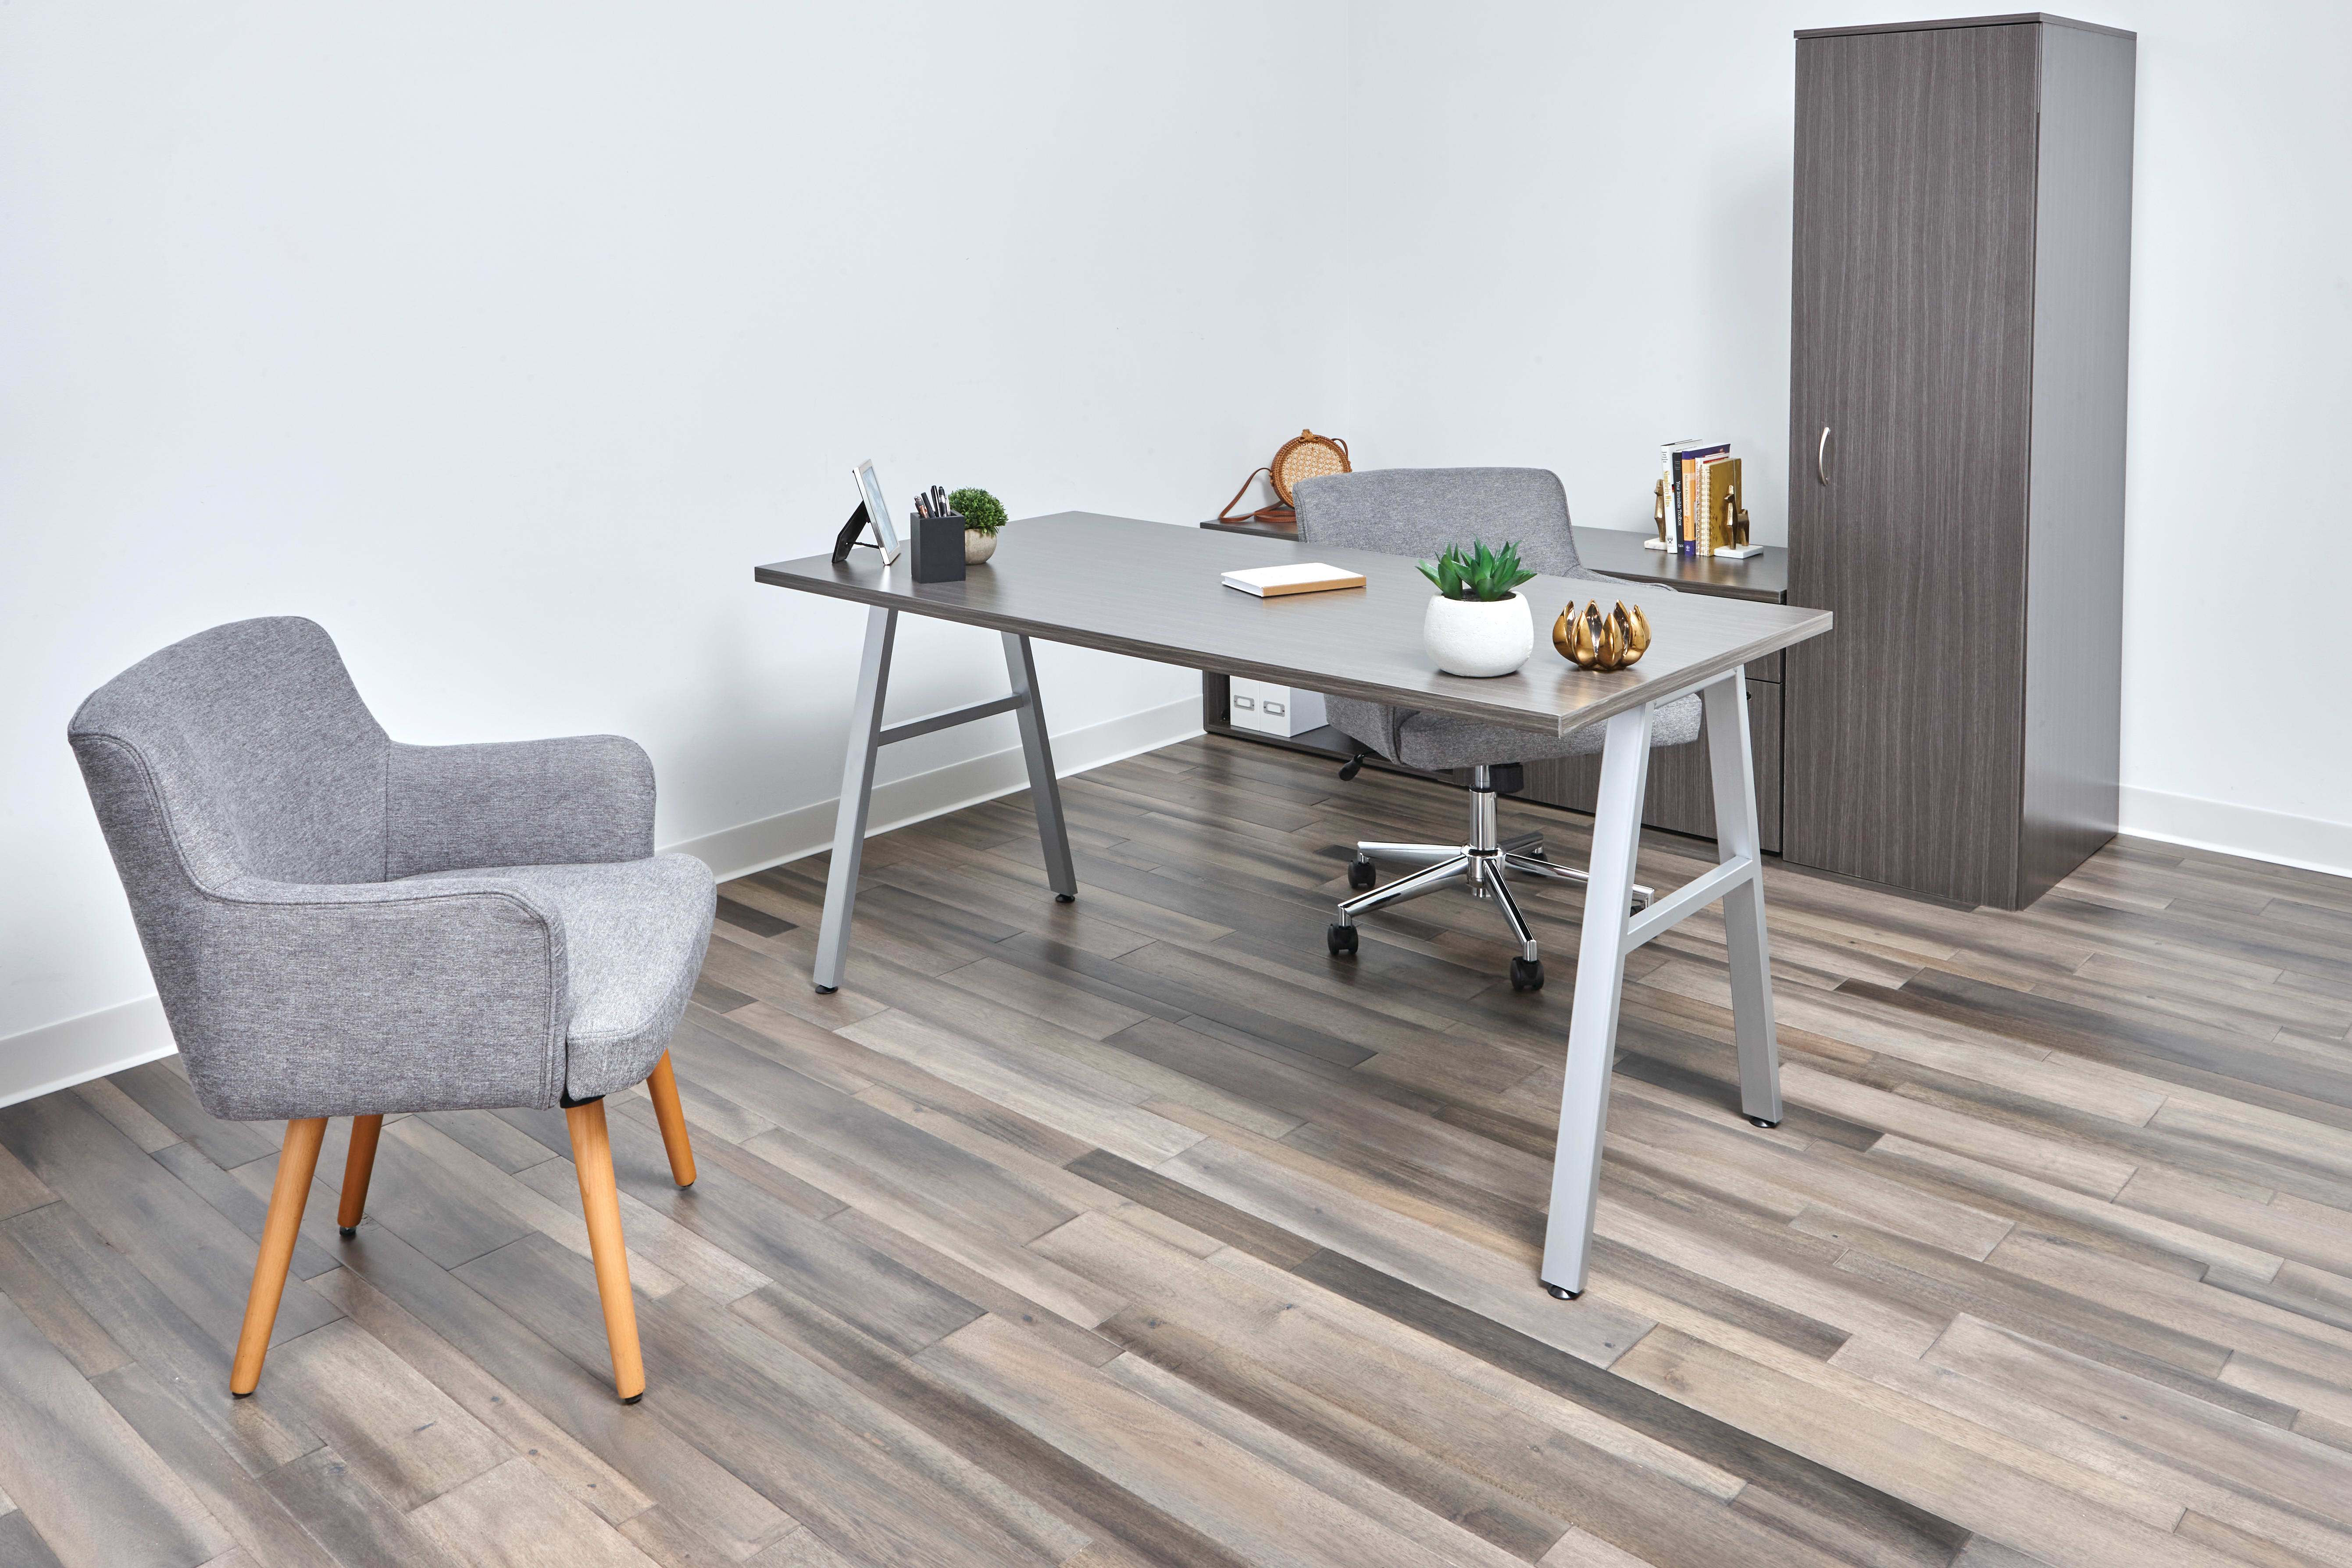 Mod desk in Slate Teak laminate with Matter seating.